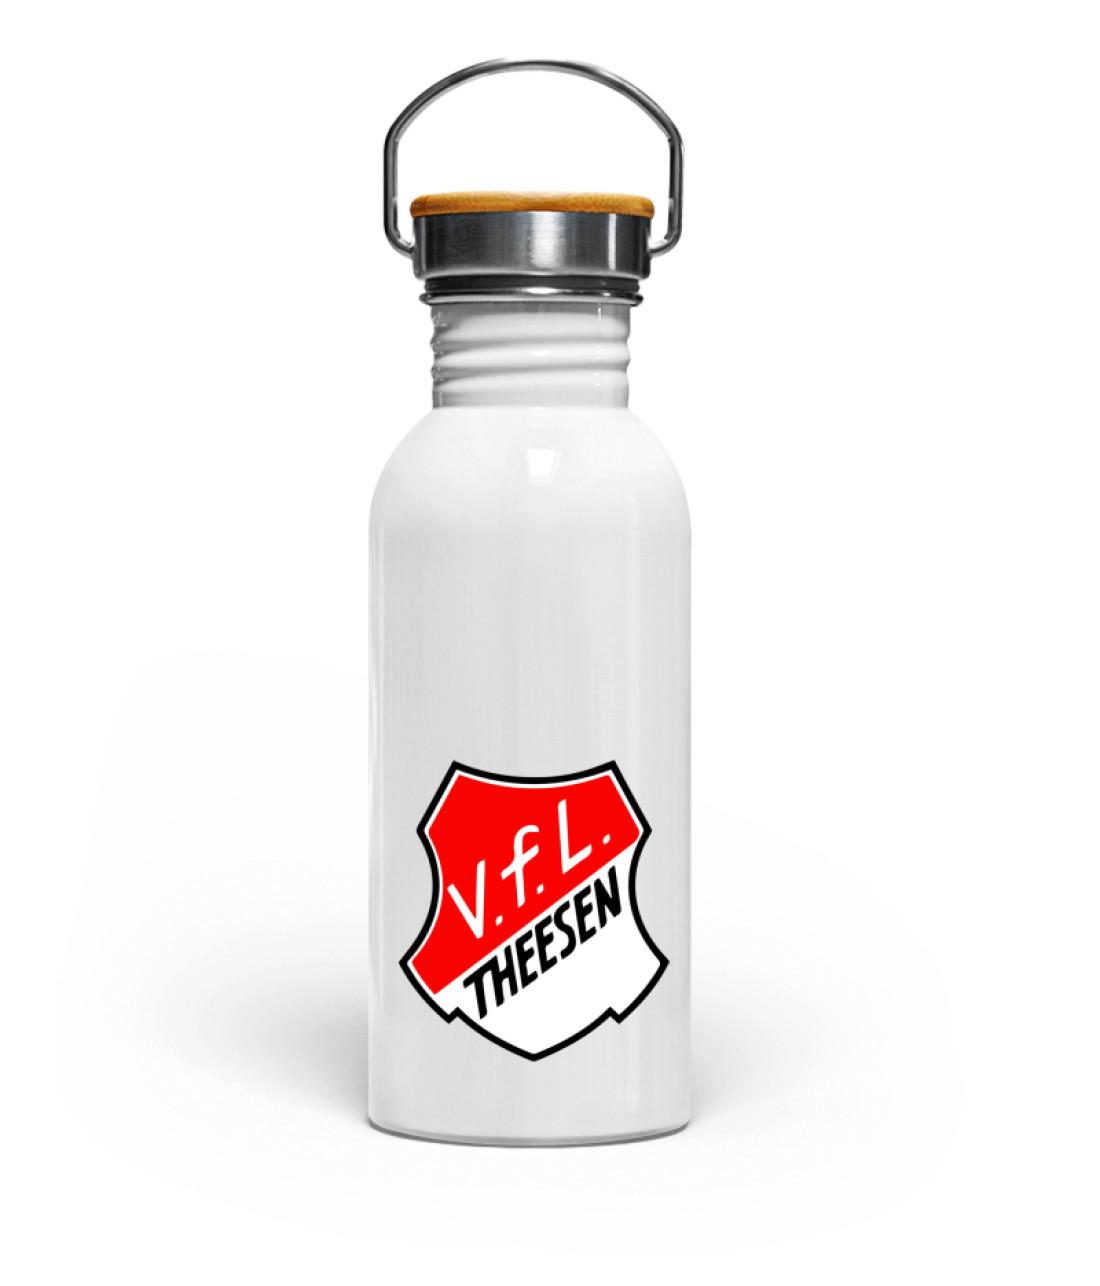 Theesen - Edelstahl Trinkflasche-3